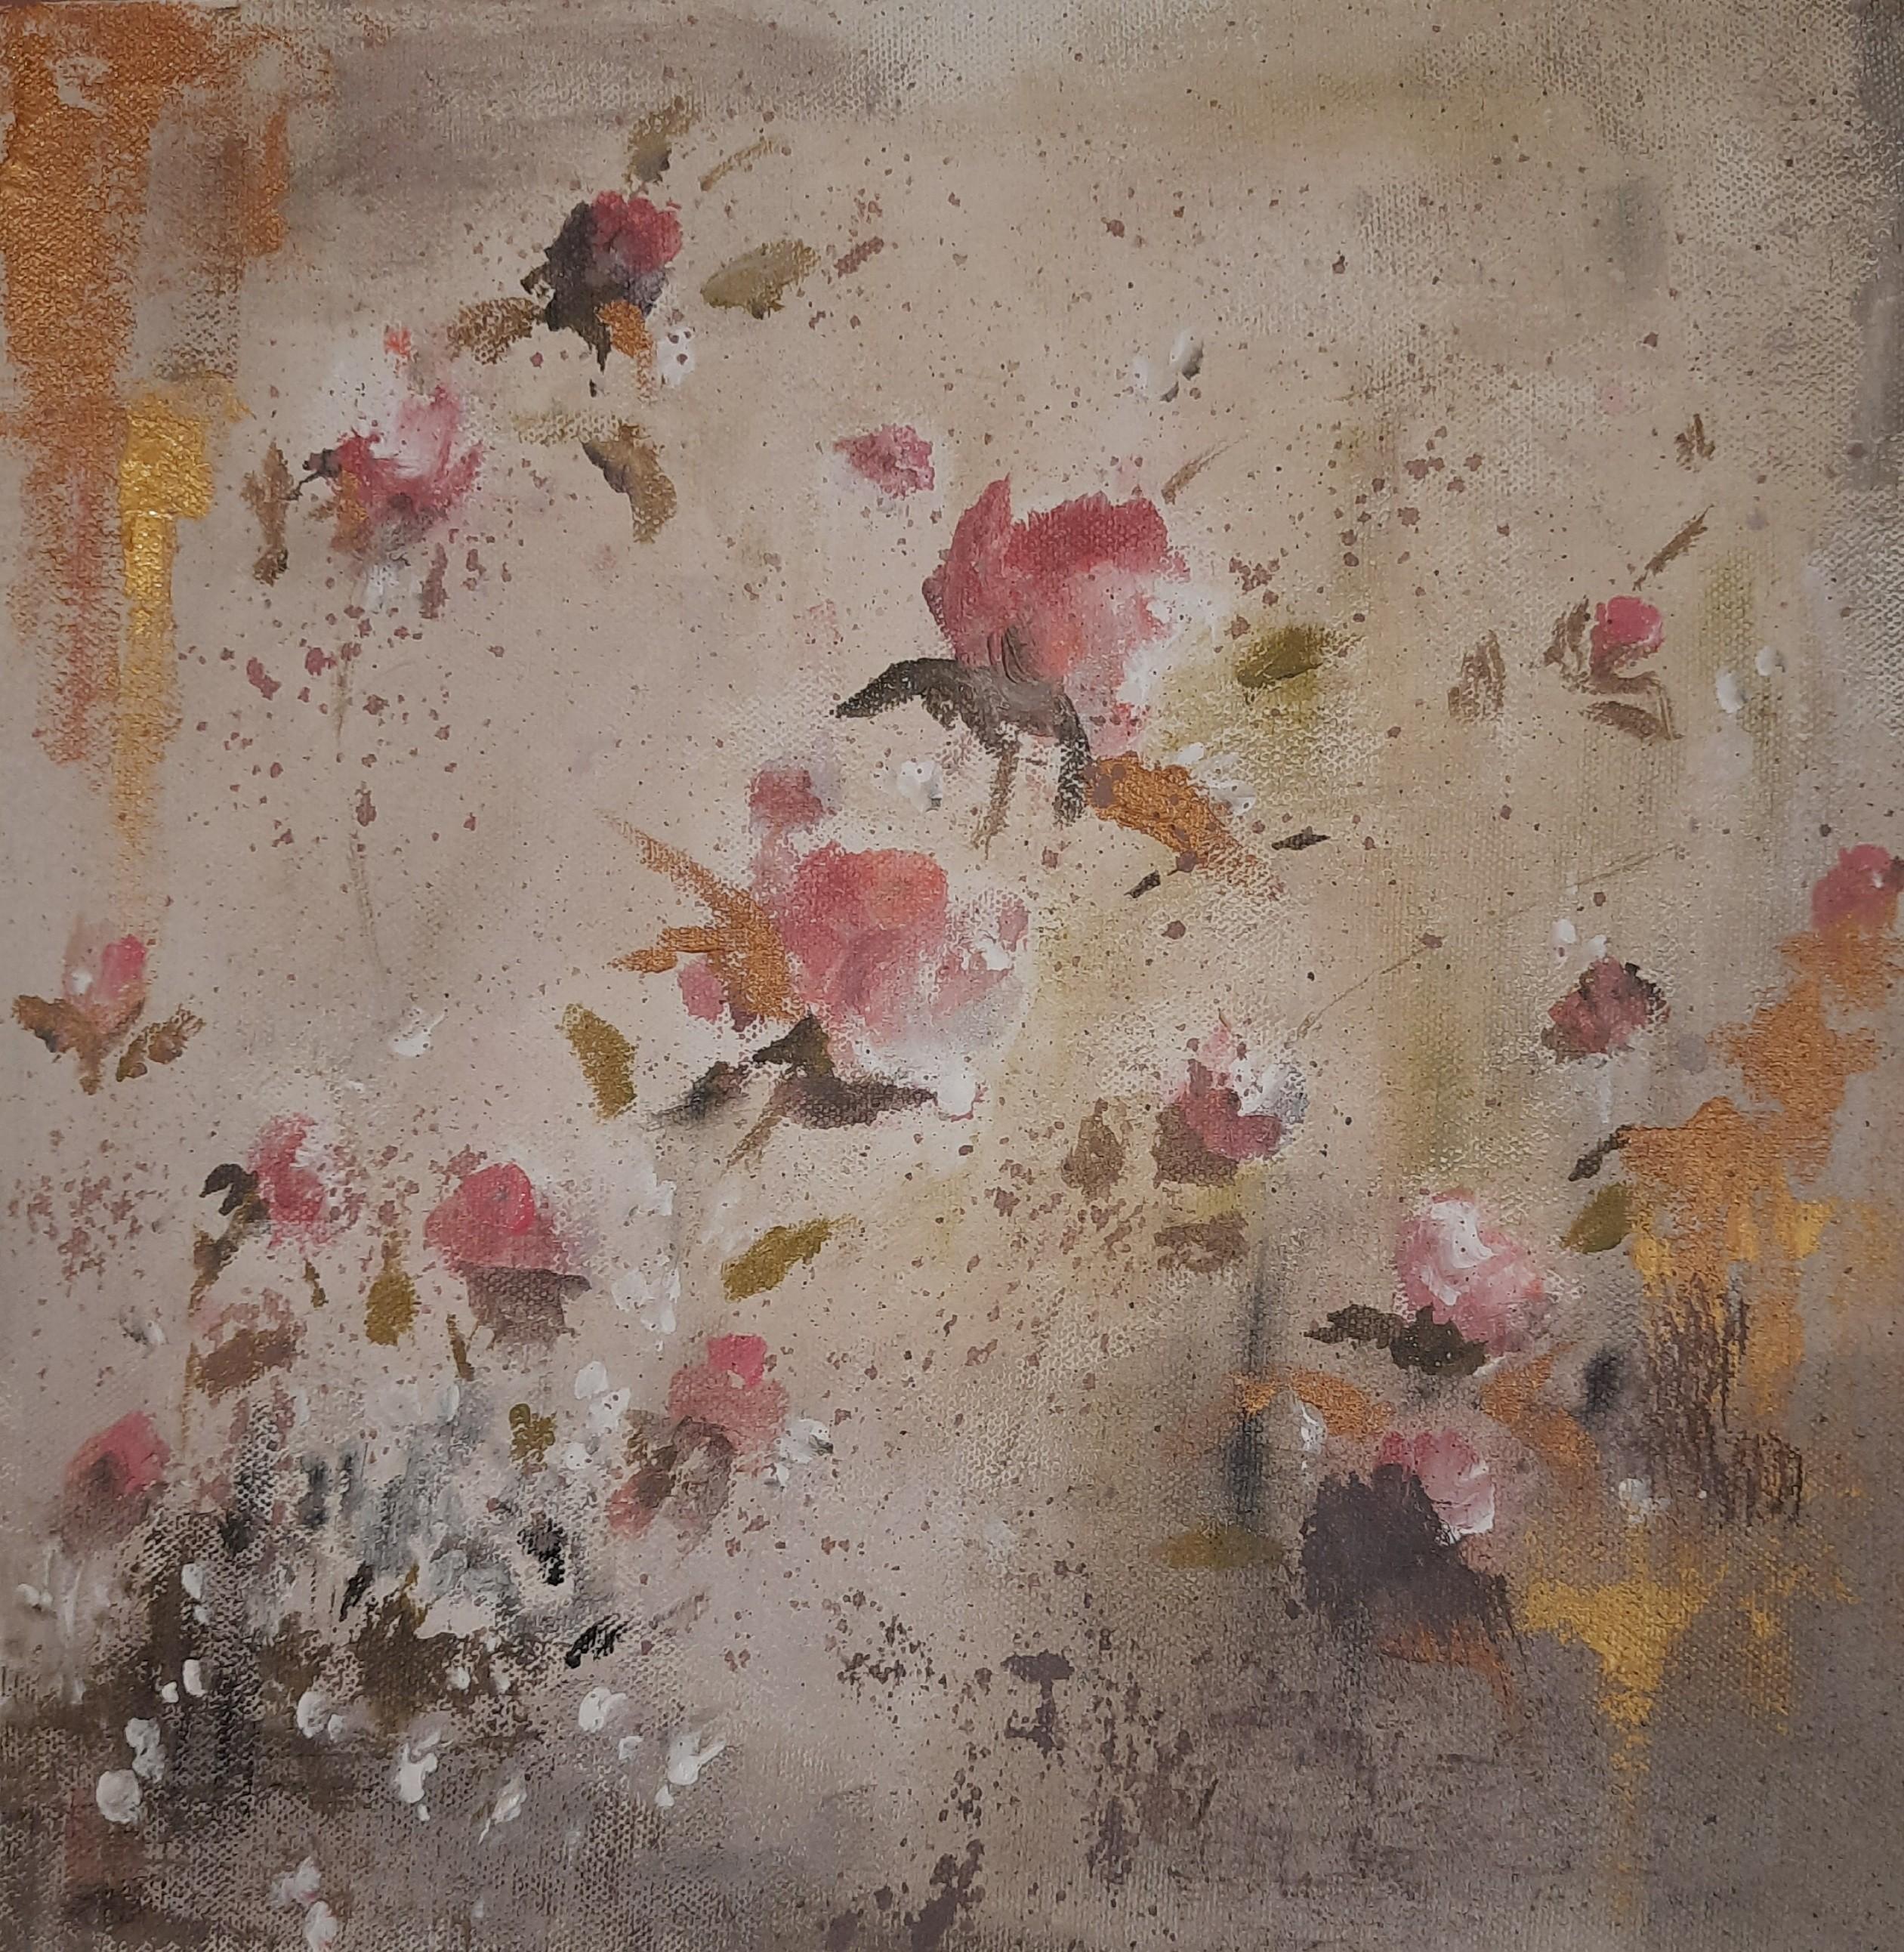 Rustic roses by Jean wijesekera